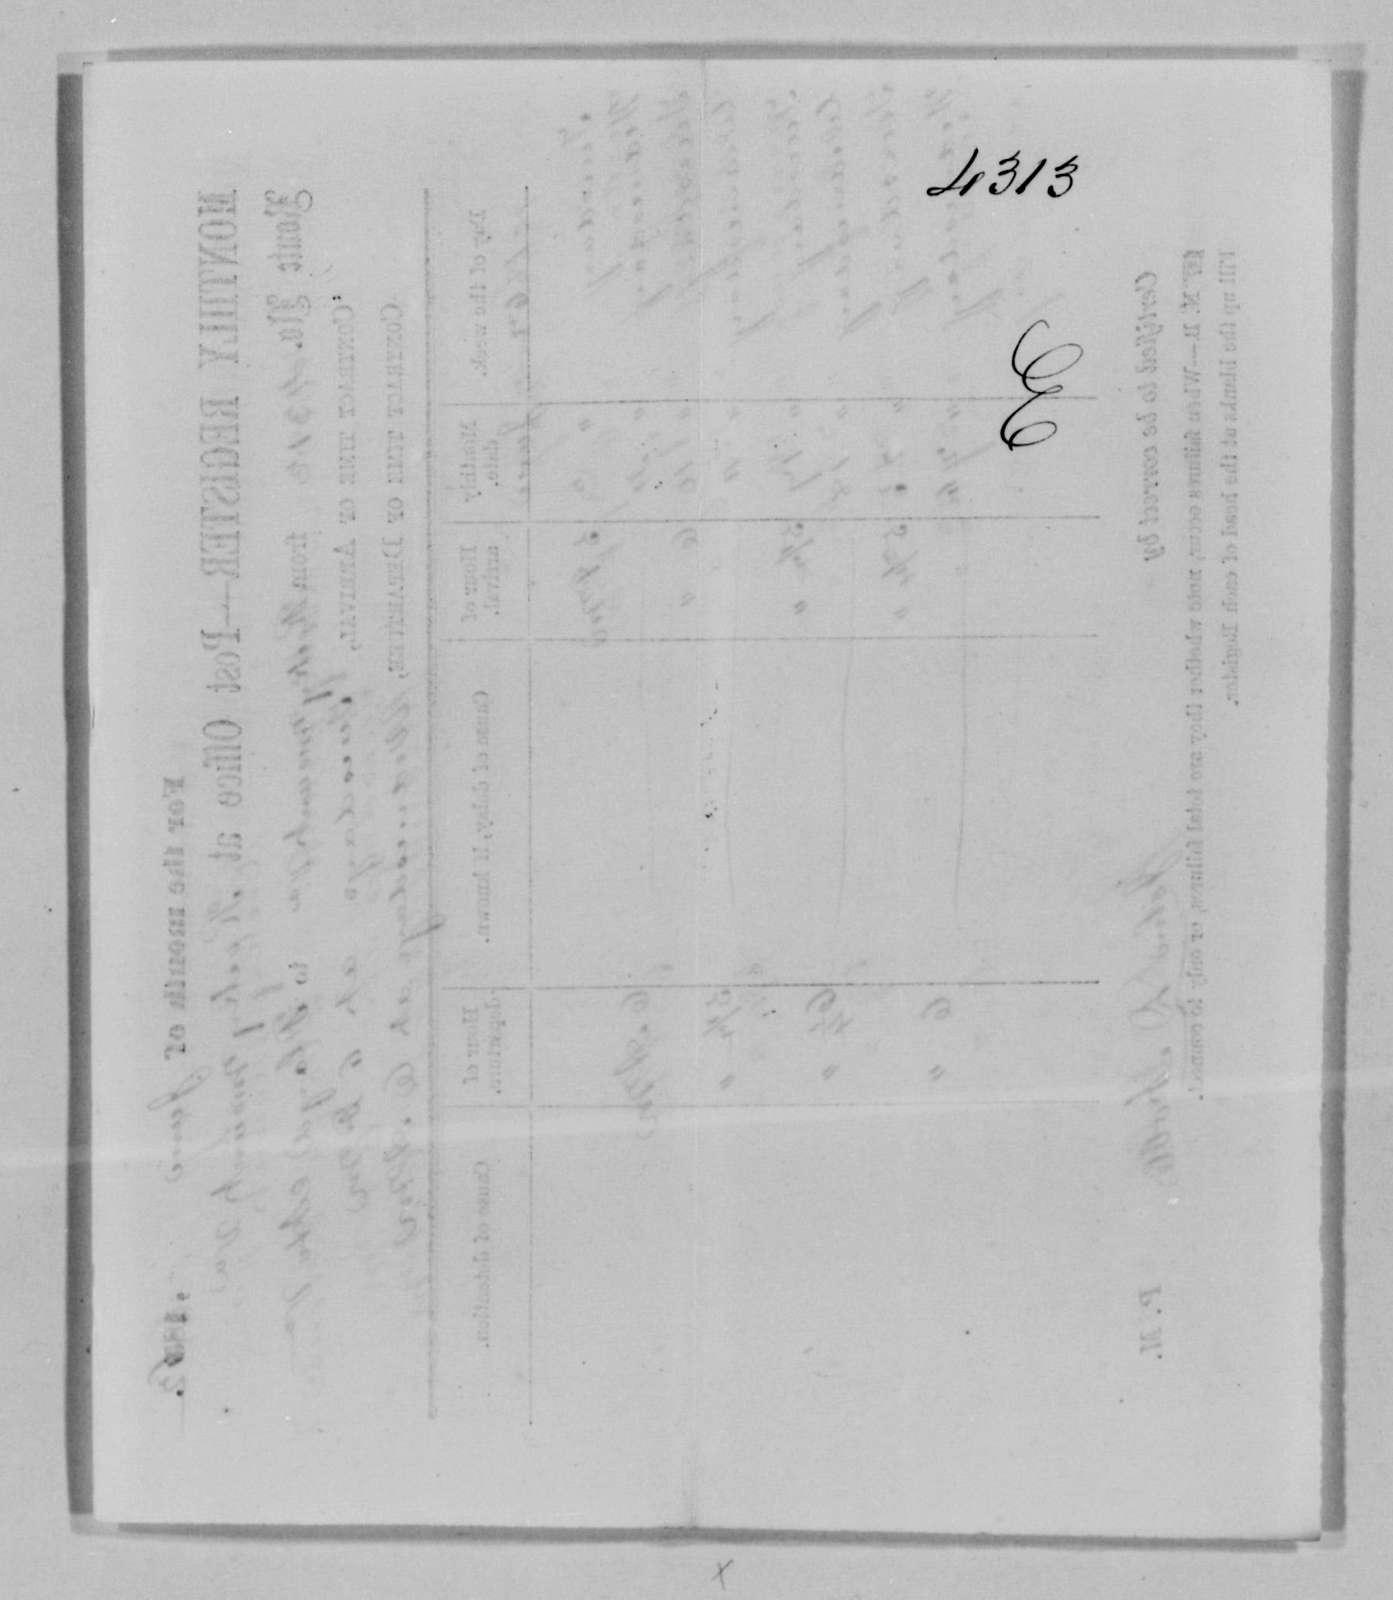 Confederate States of America records: Microfilm Reel 62